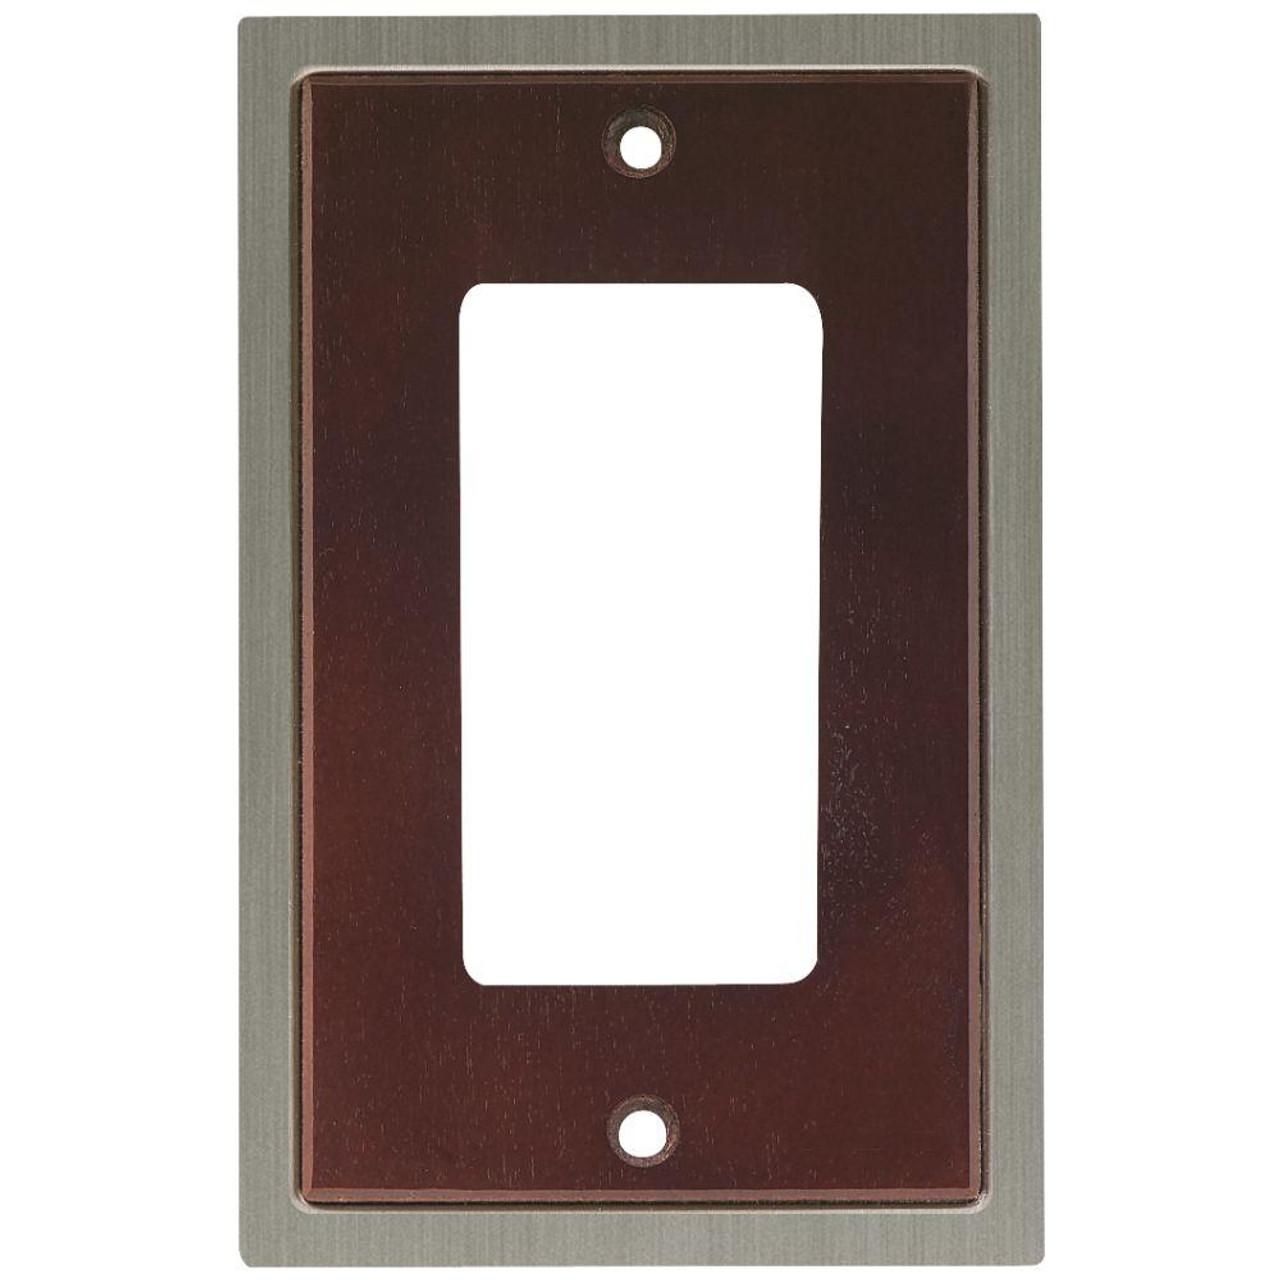 W10586-ESN Wood Insert Espresso  & Satin Nickel GFCI Cover Plate